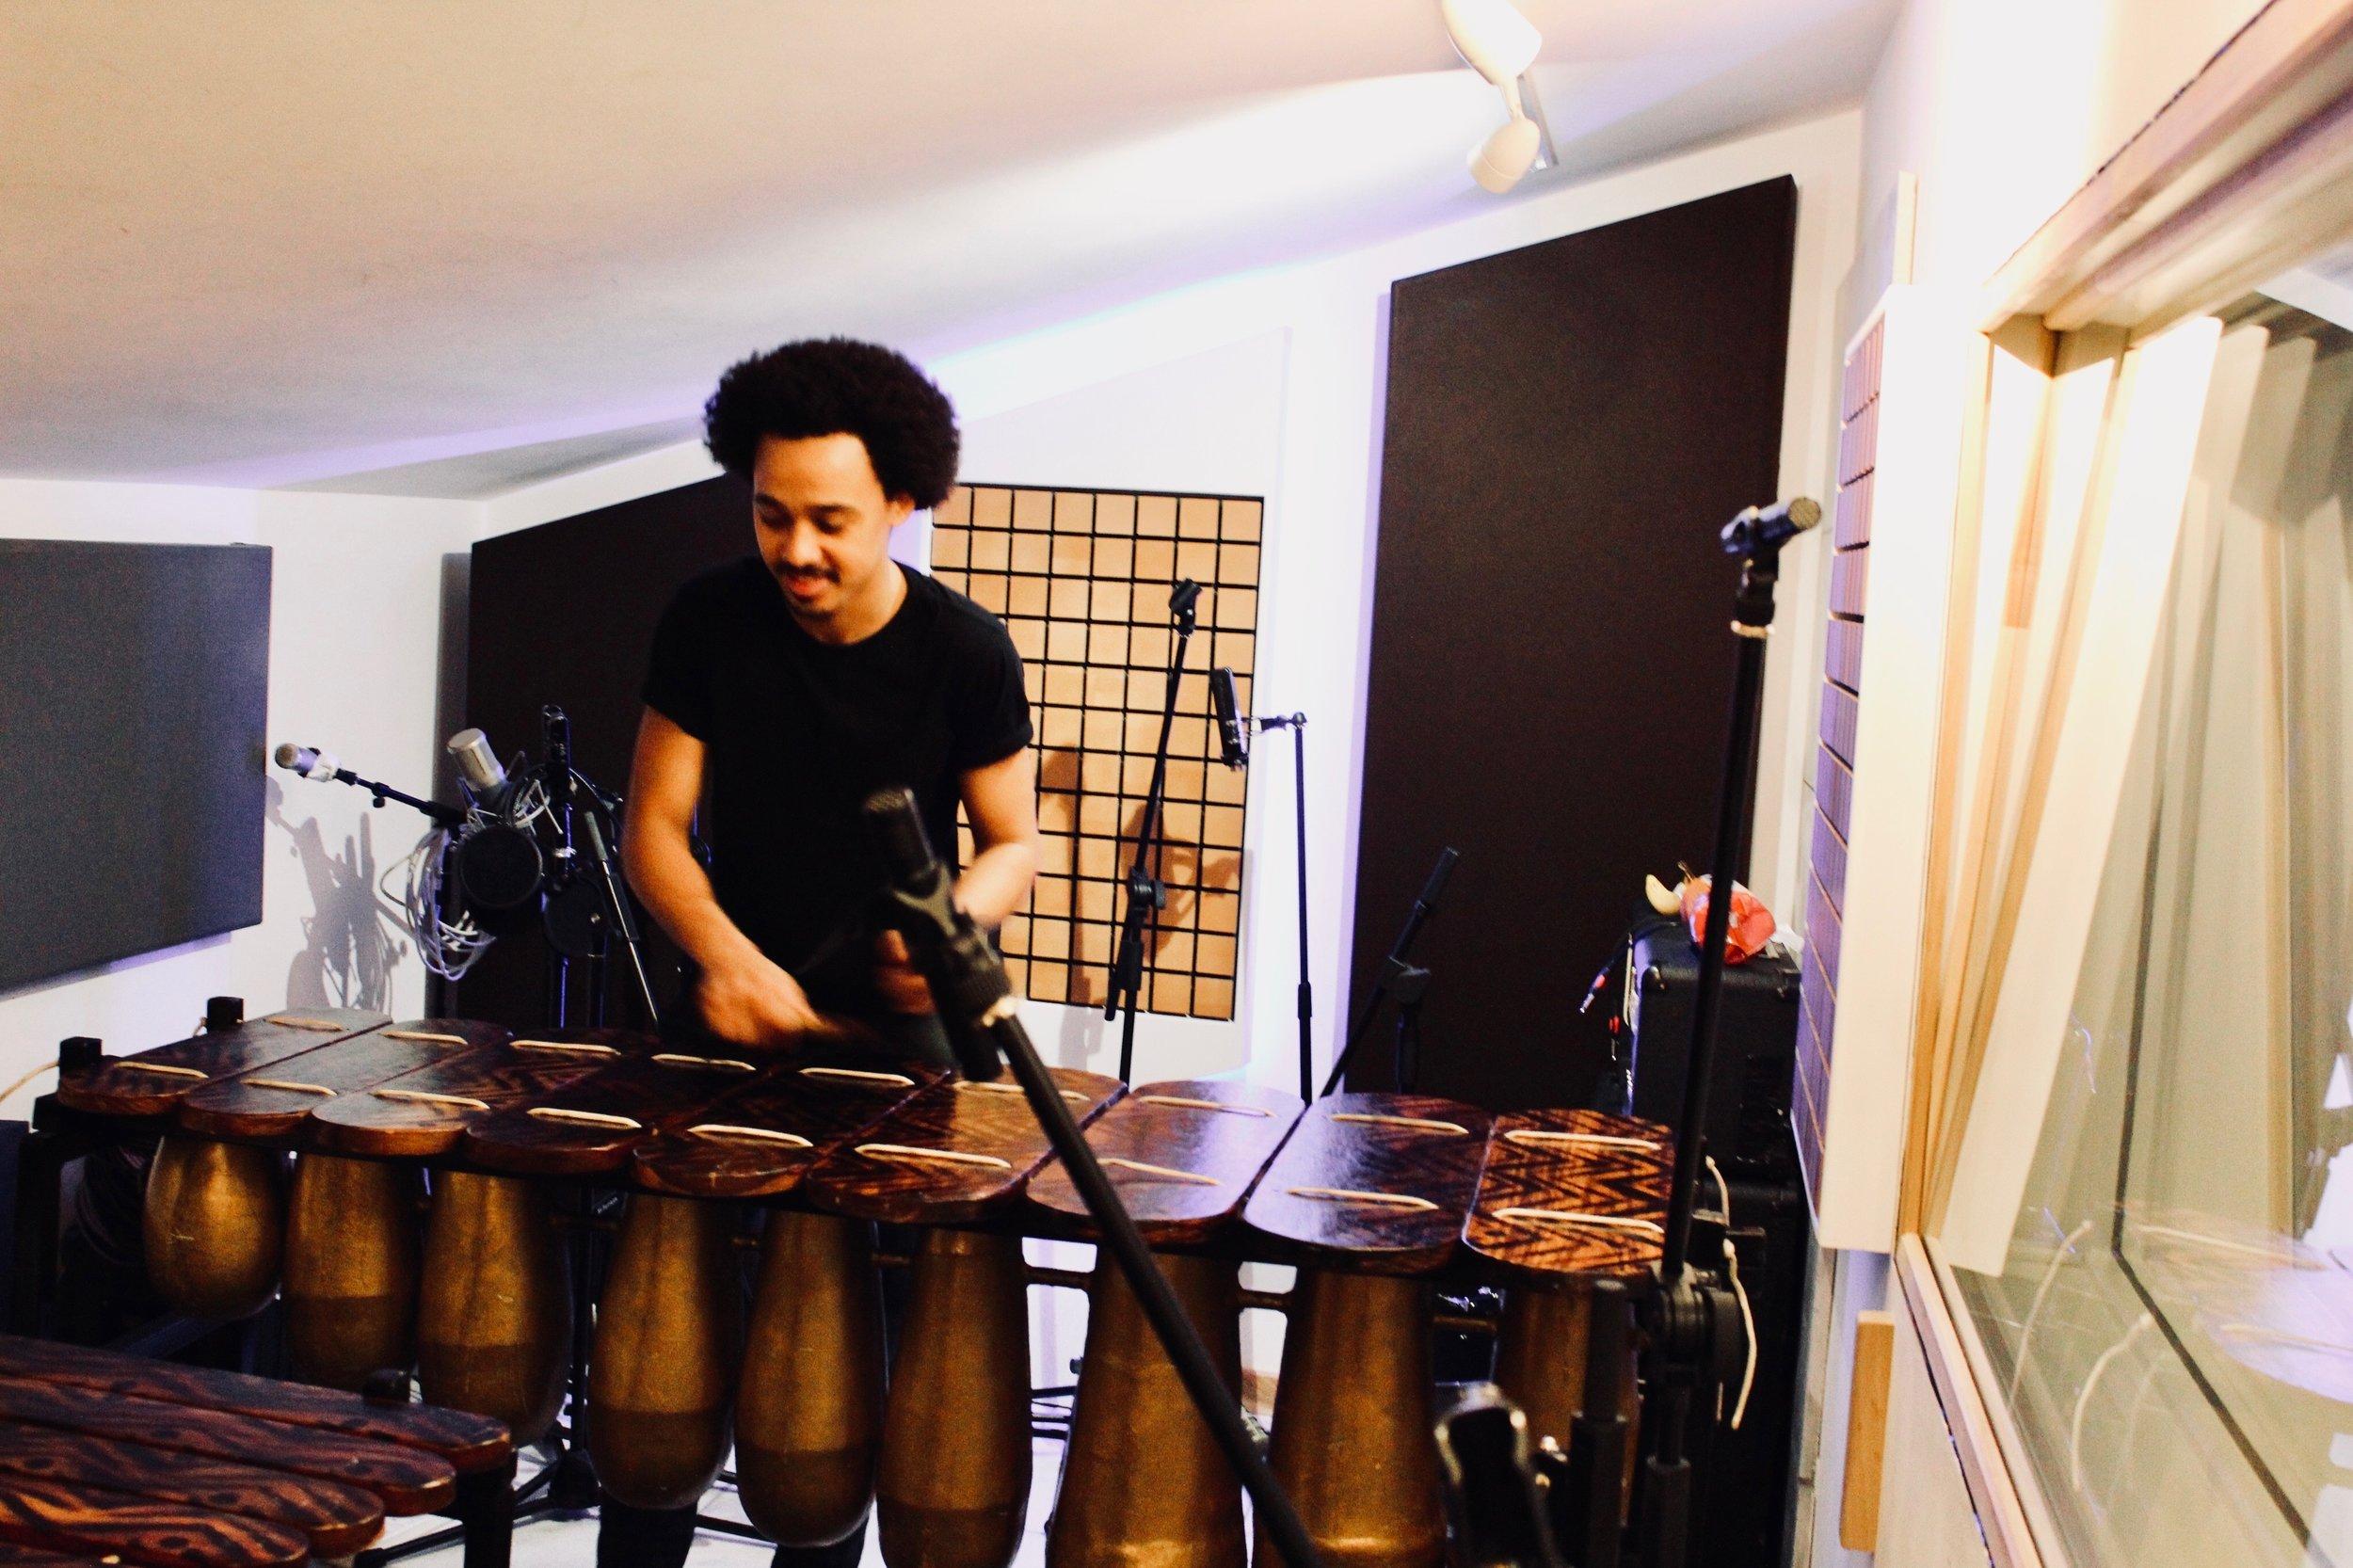 Blue Studios Dalston - Marimba Band Recording